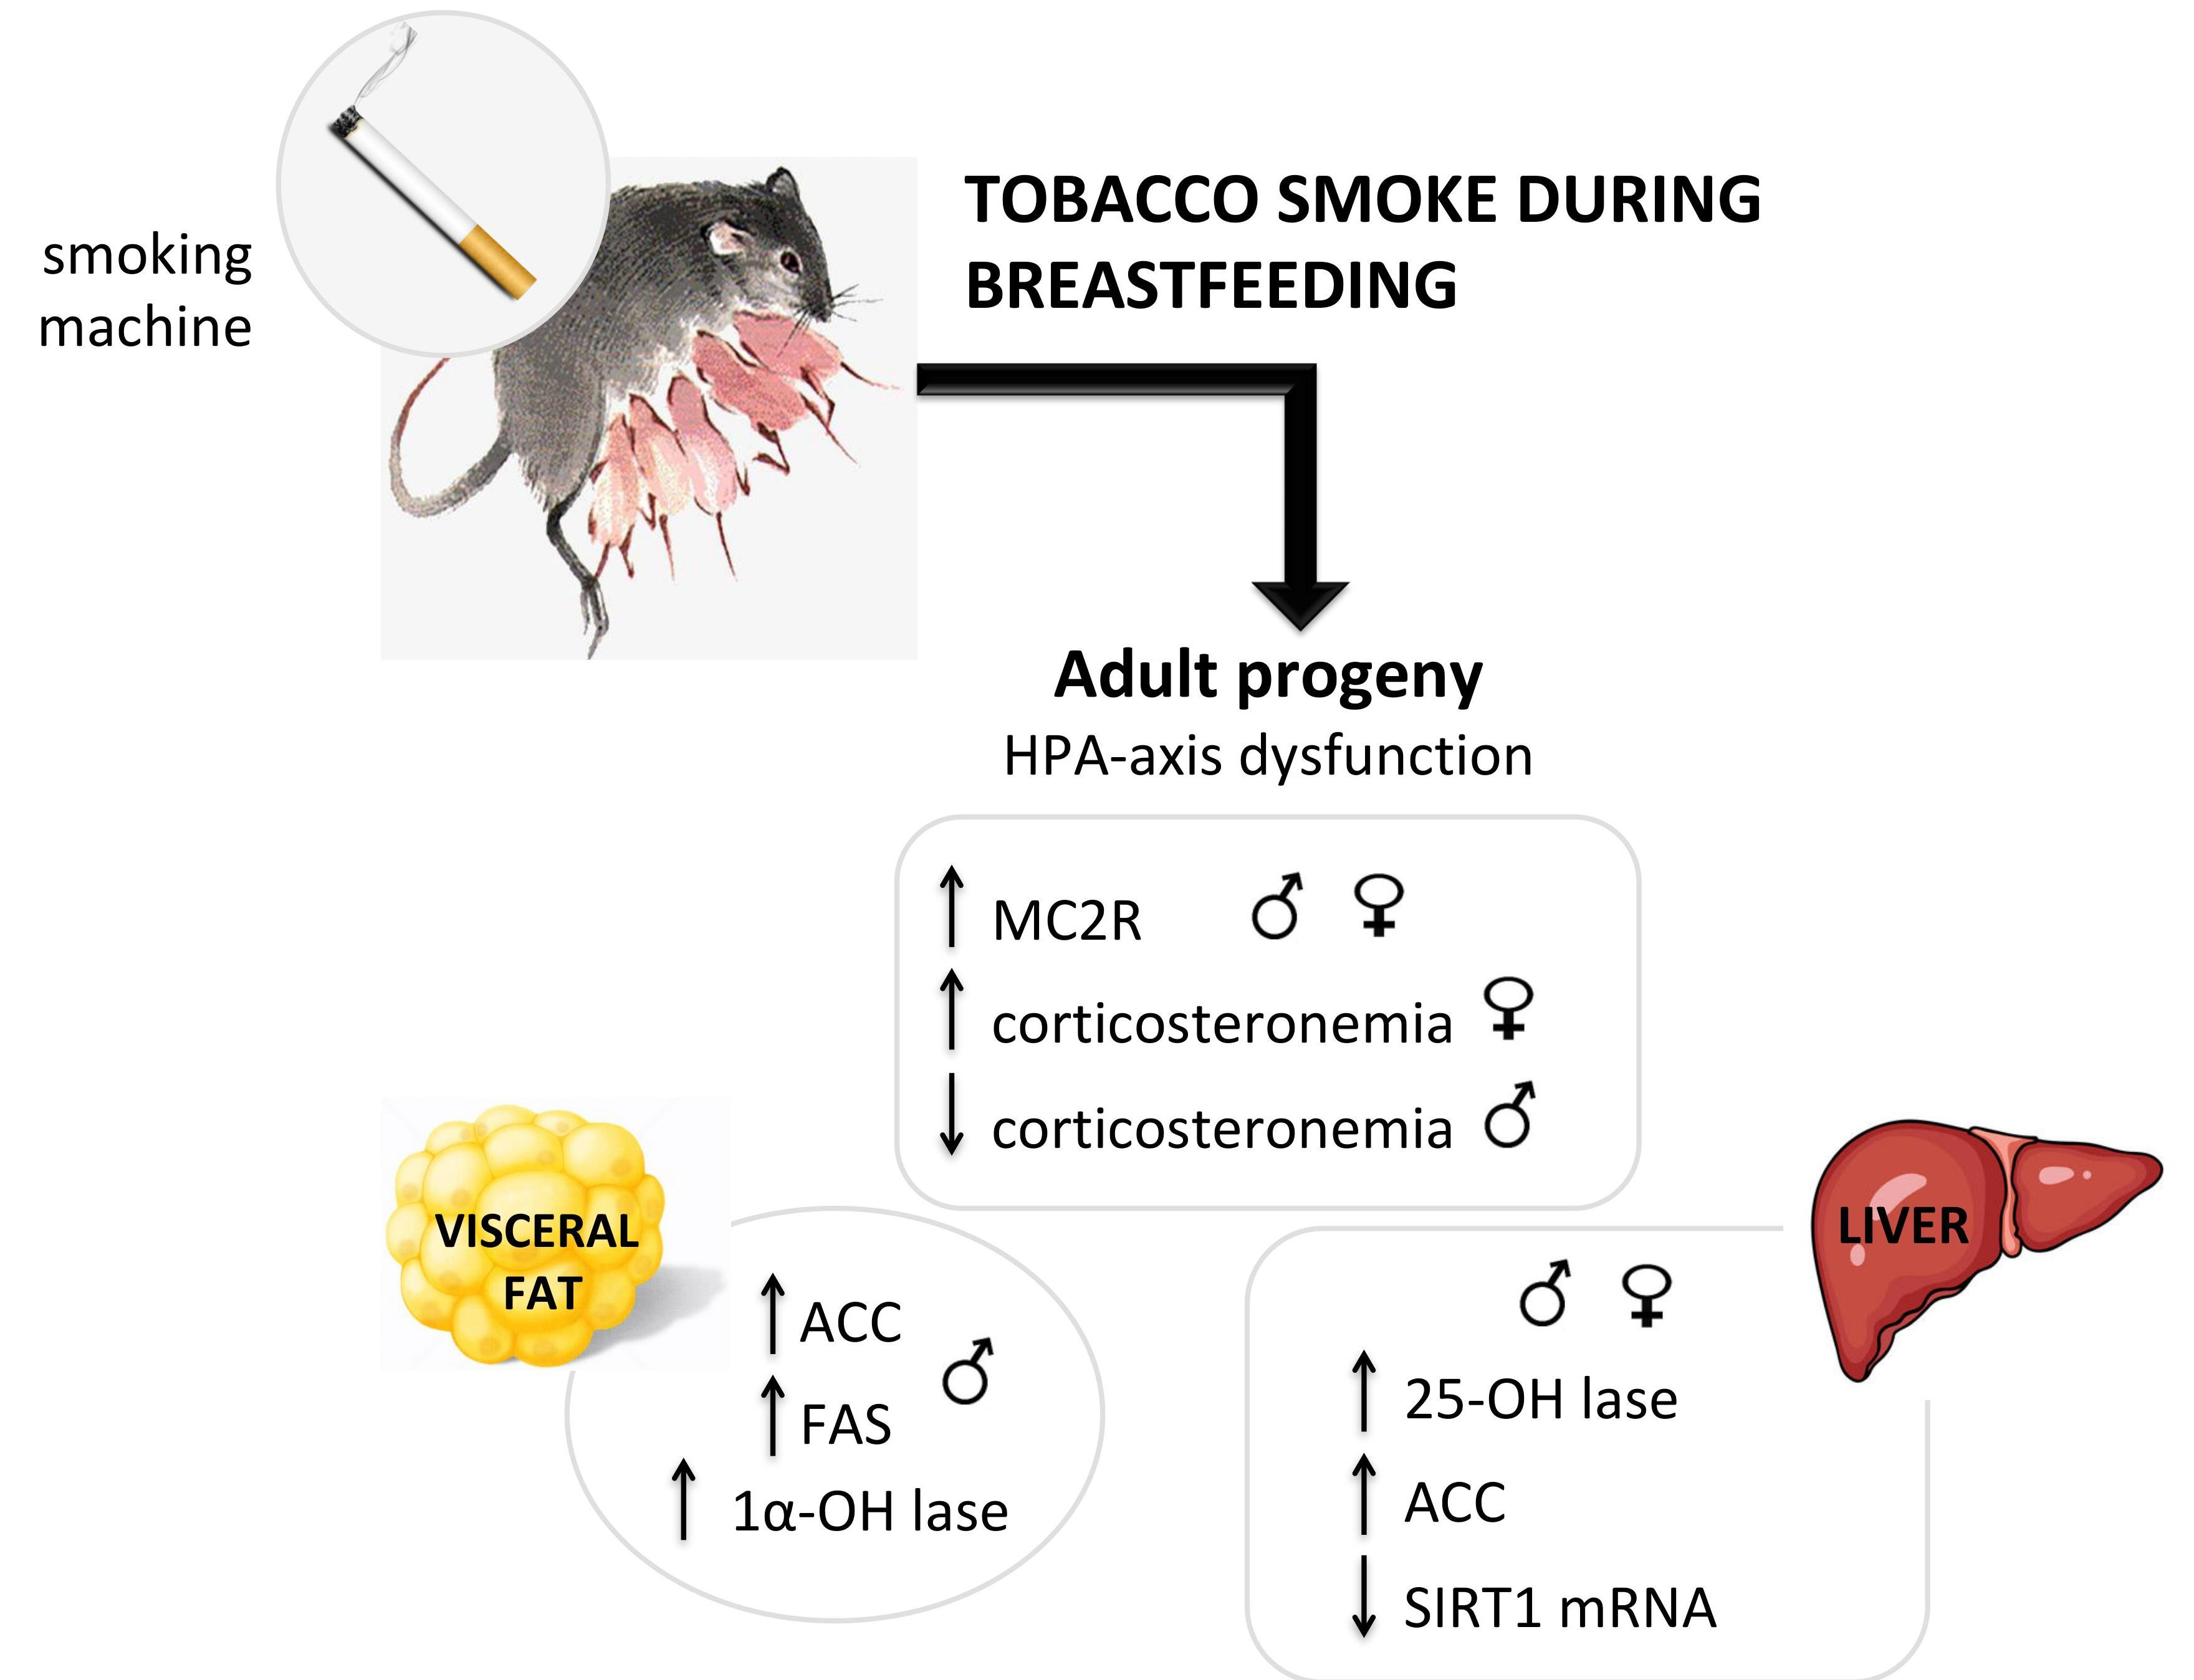 Smoking when breastfeeding. Harm of smoking during breastfeeding 41